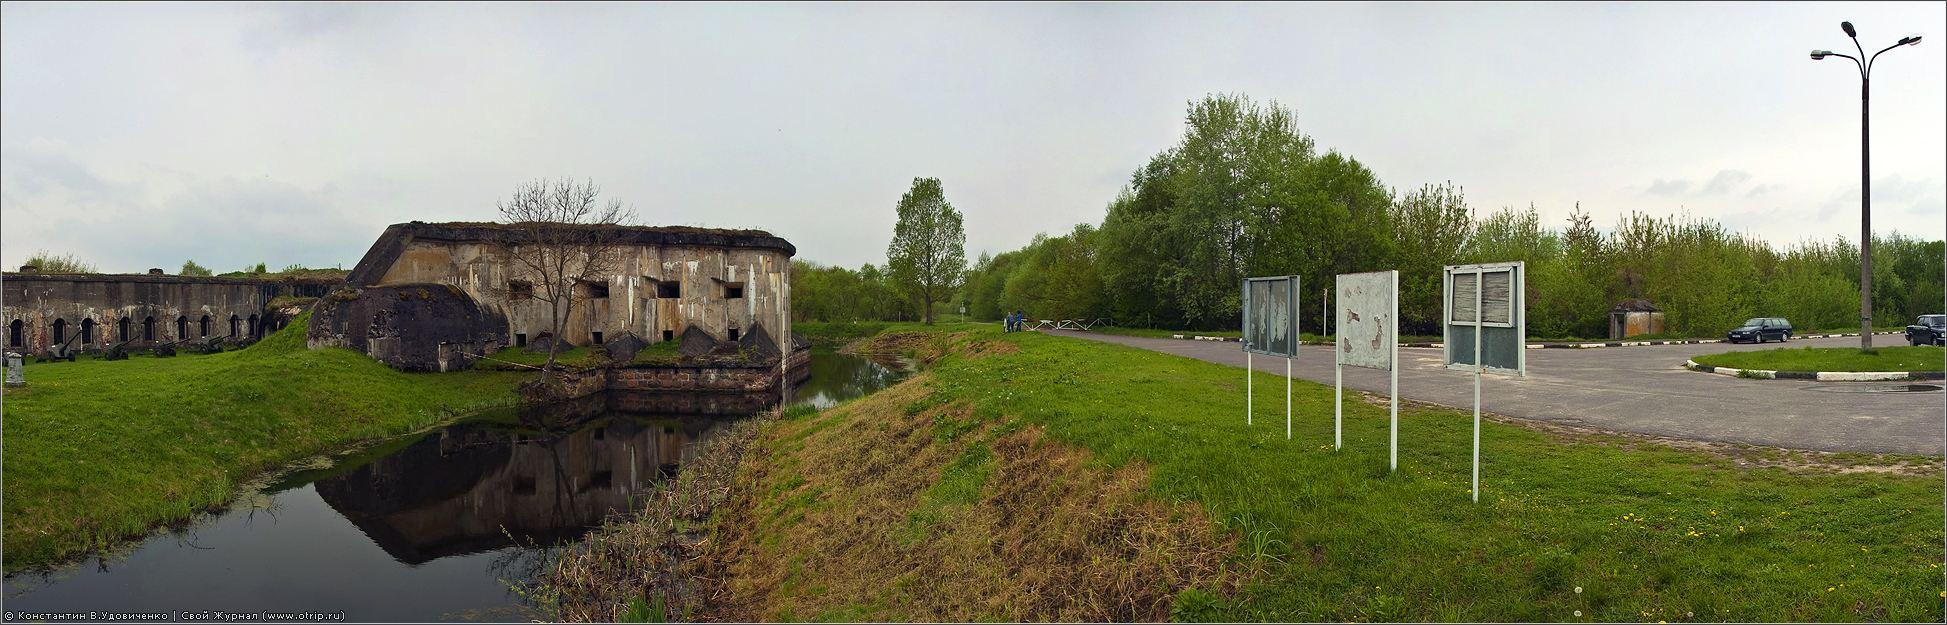 3961-3971-8918x3138s_2.jpg - Беларусь 2010 (01-03.05.2010)